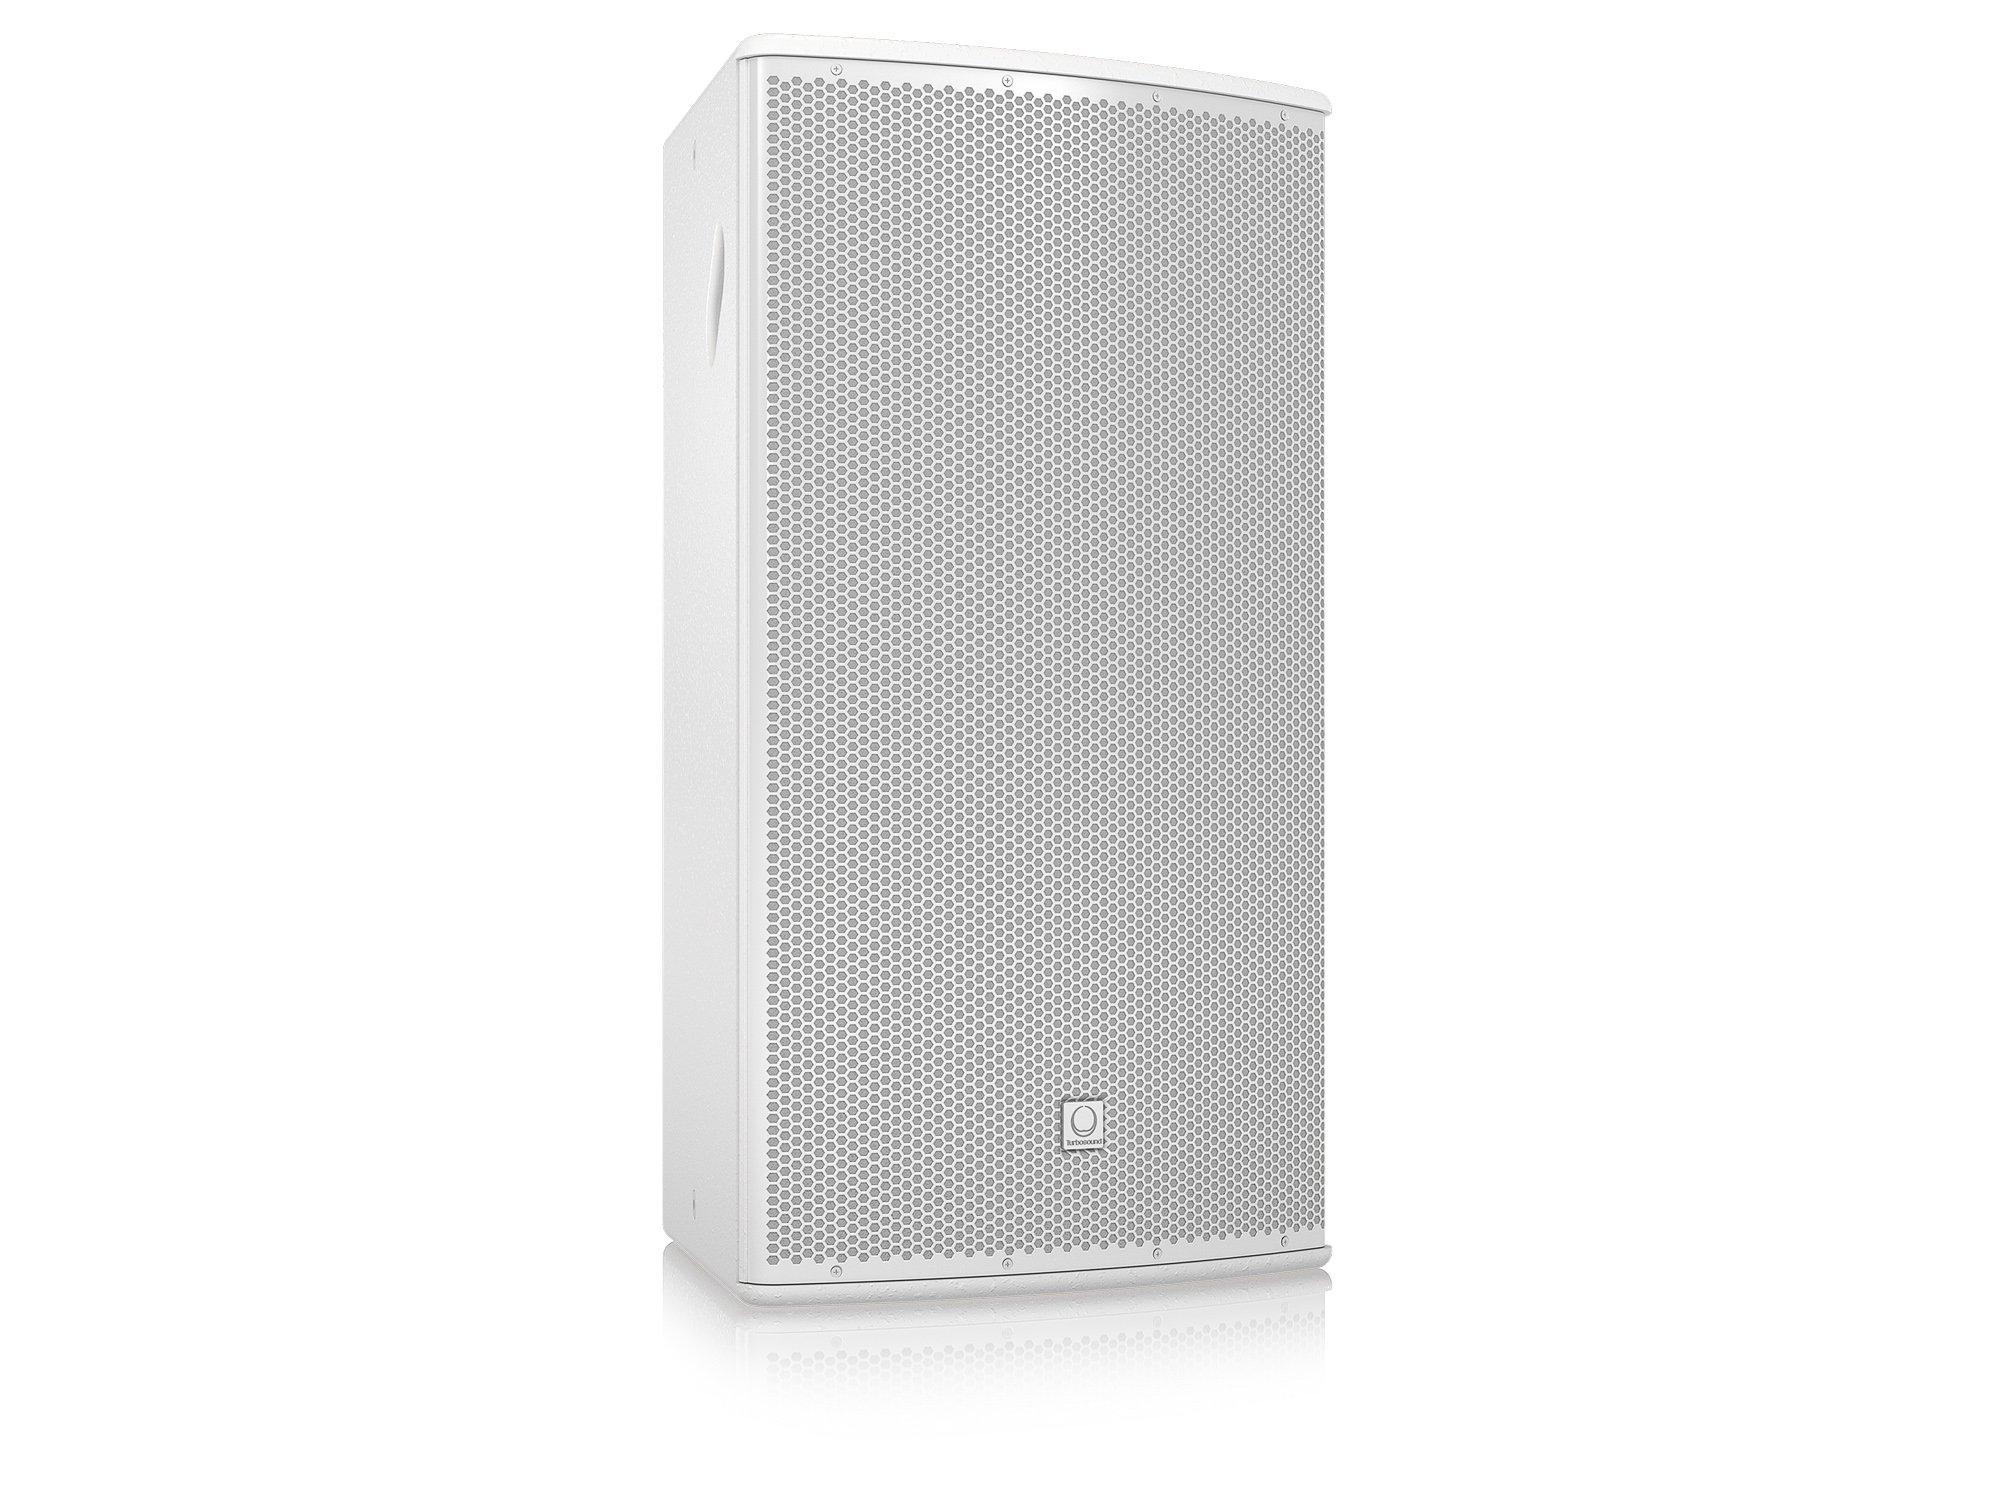 "15"" 500W (8 Ohms) 2-Way Full-Range Passive/Bi-Amp Loudspeaker with Klark Teknik DSP, ULTRANET Networking, and 90°x40° Dispersion in White"